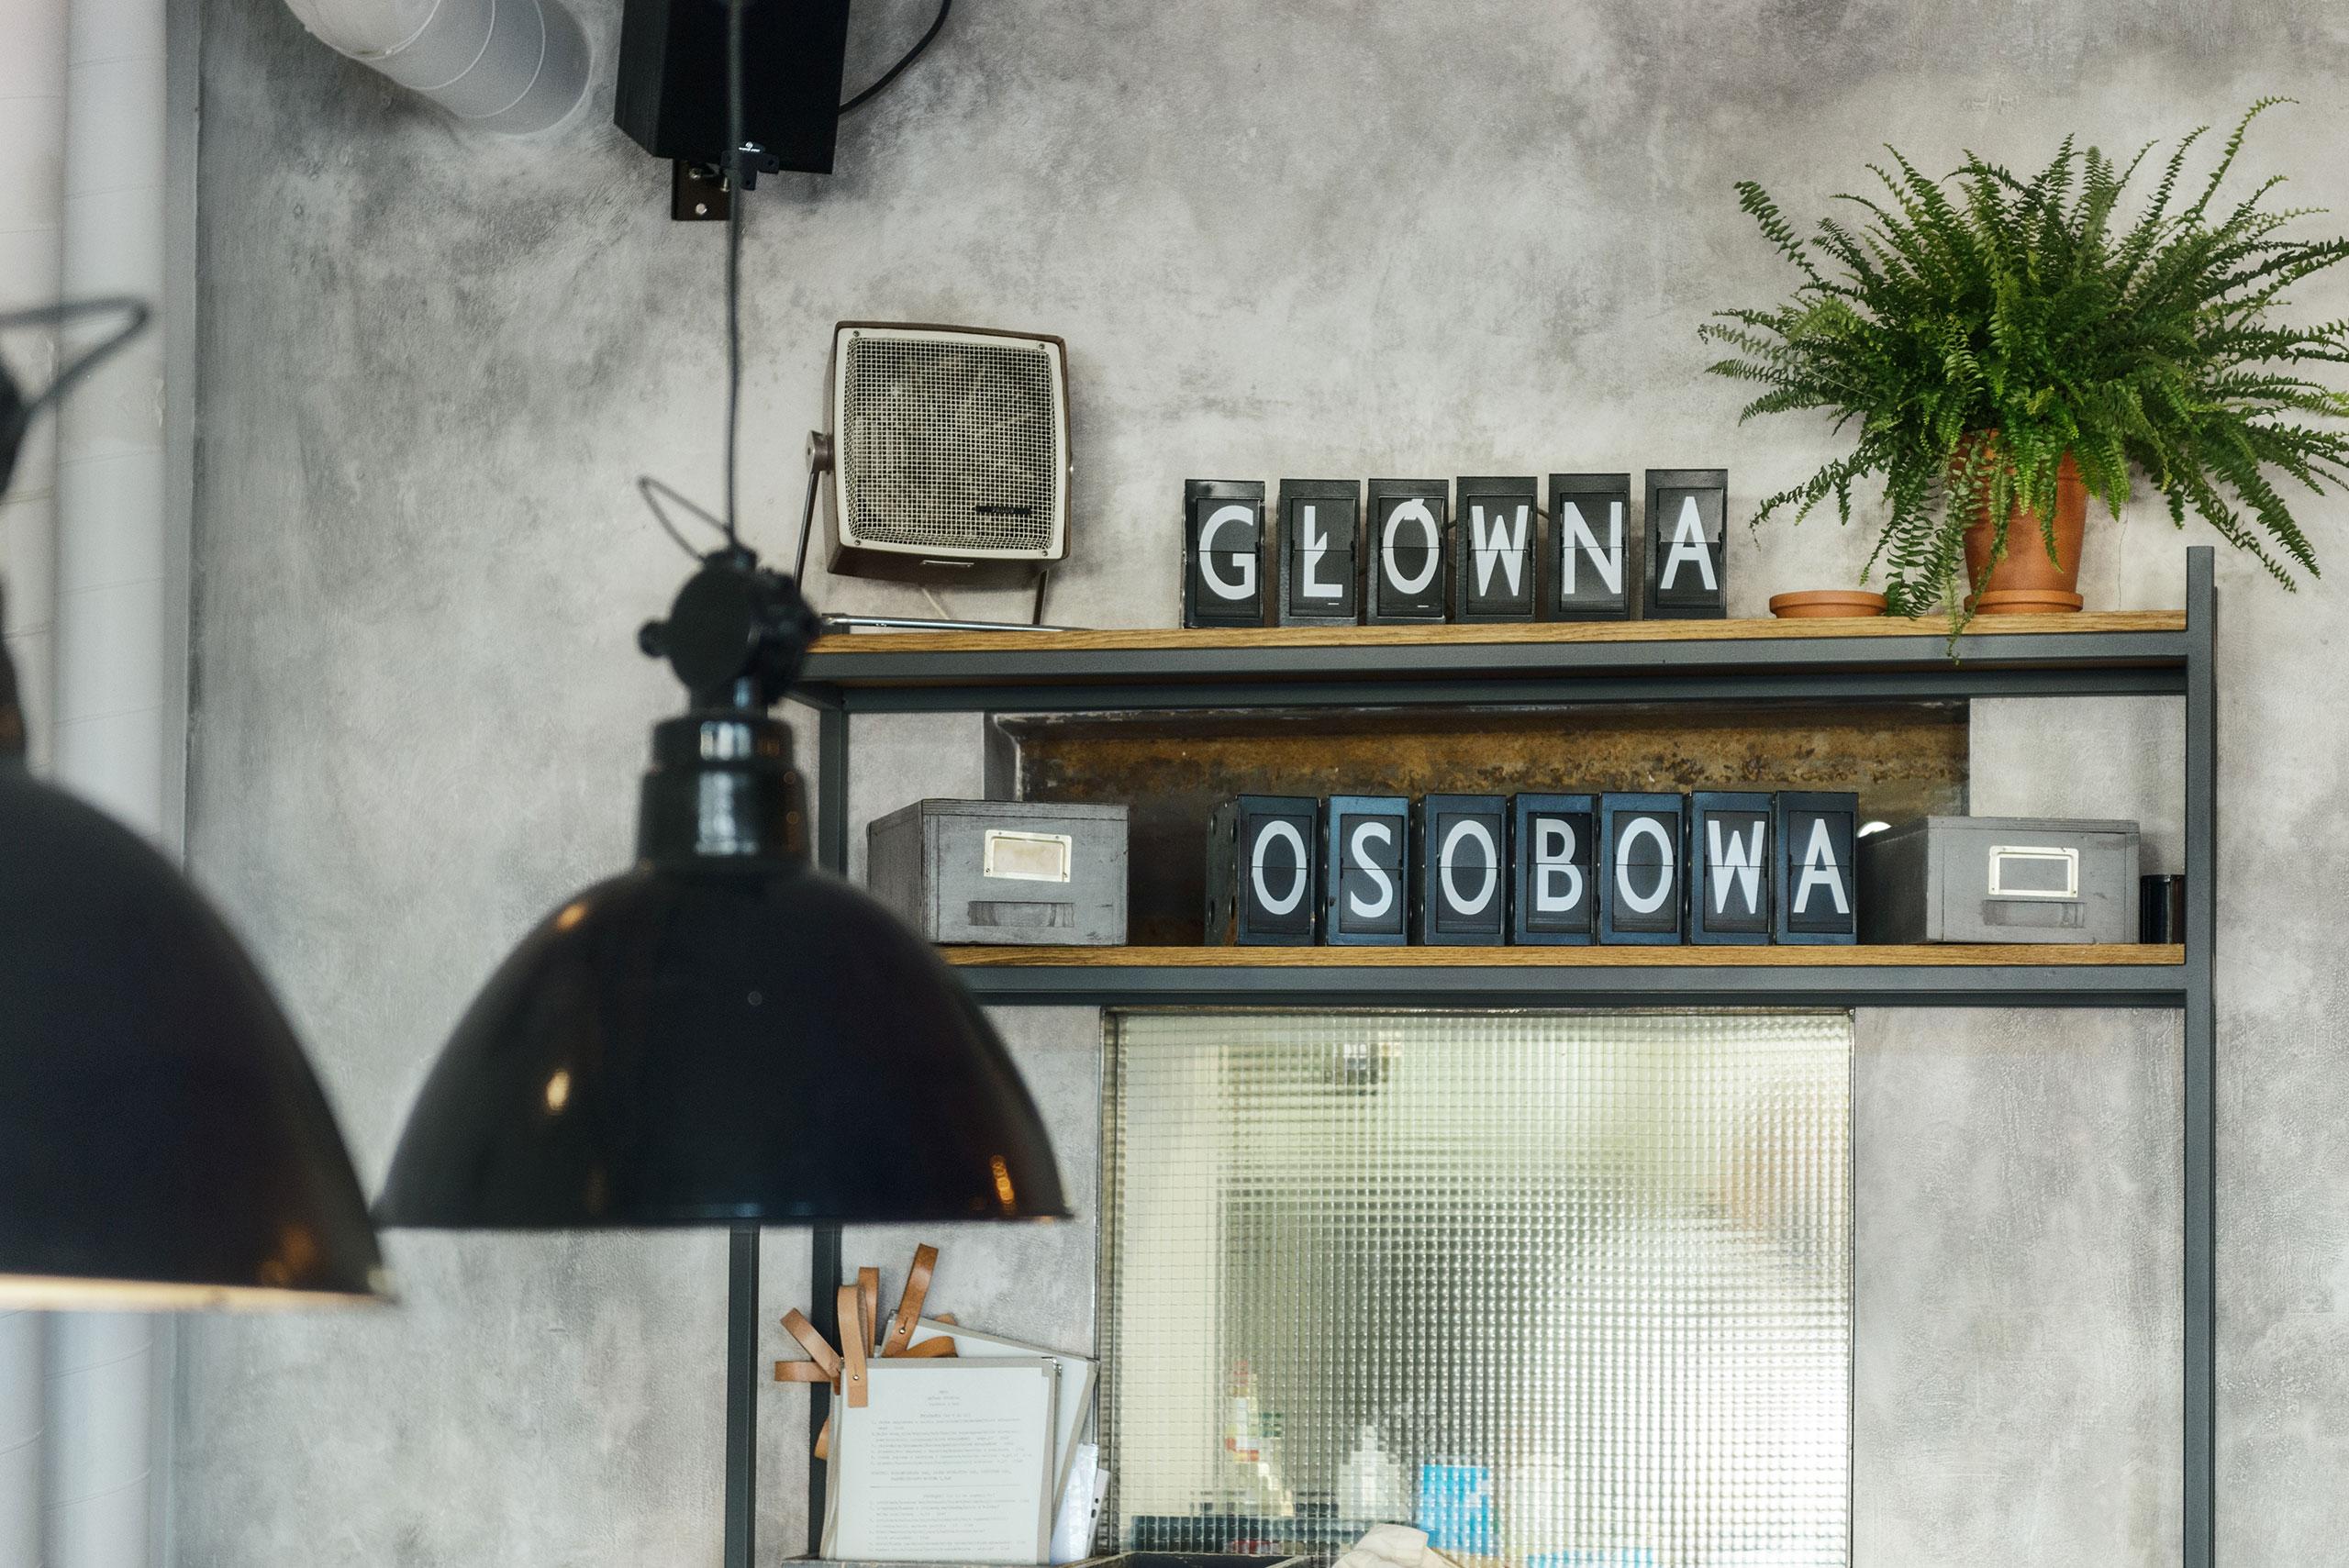 gowna osobowa bar by pbstudio and filip kozarsk 6 Główna Osobowa bar by PB/STUDIO and Filip Kozarsk